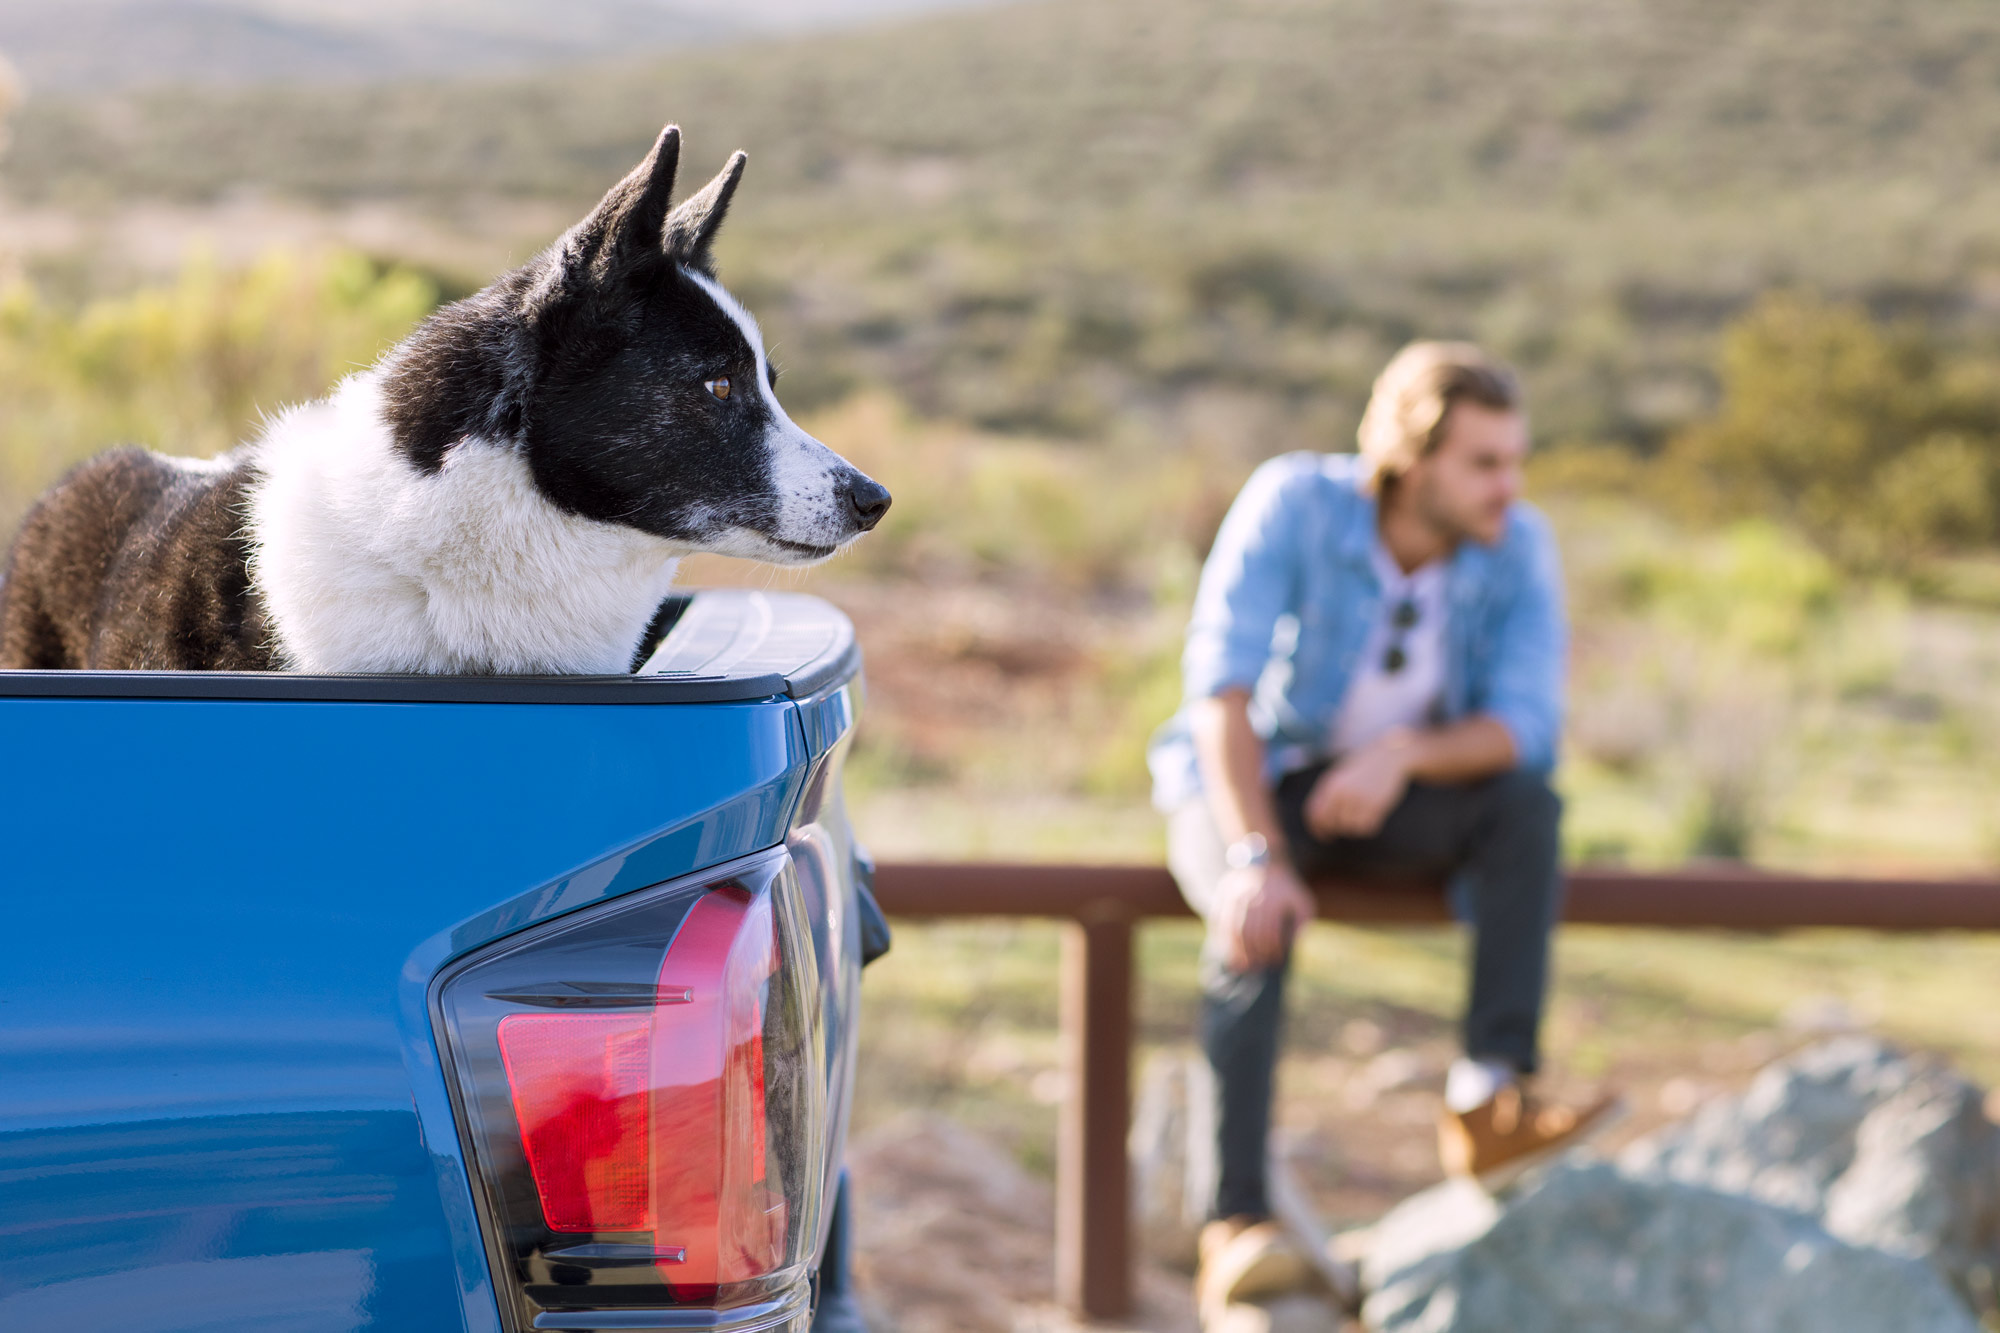 lou-mora-automotive-lifestyle-toyota-tacoma-pro-002.jpg